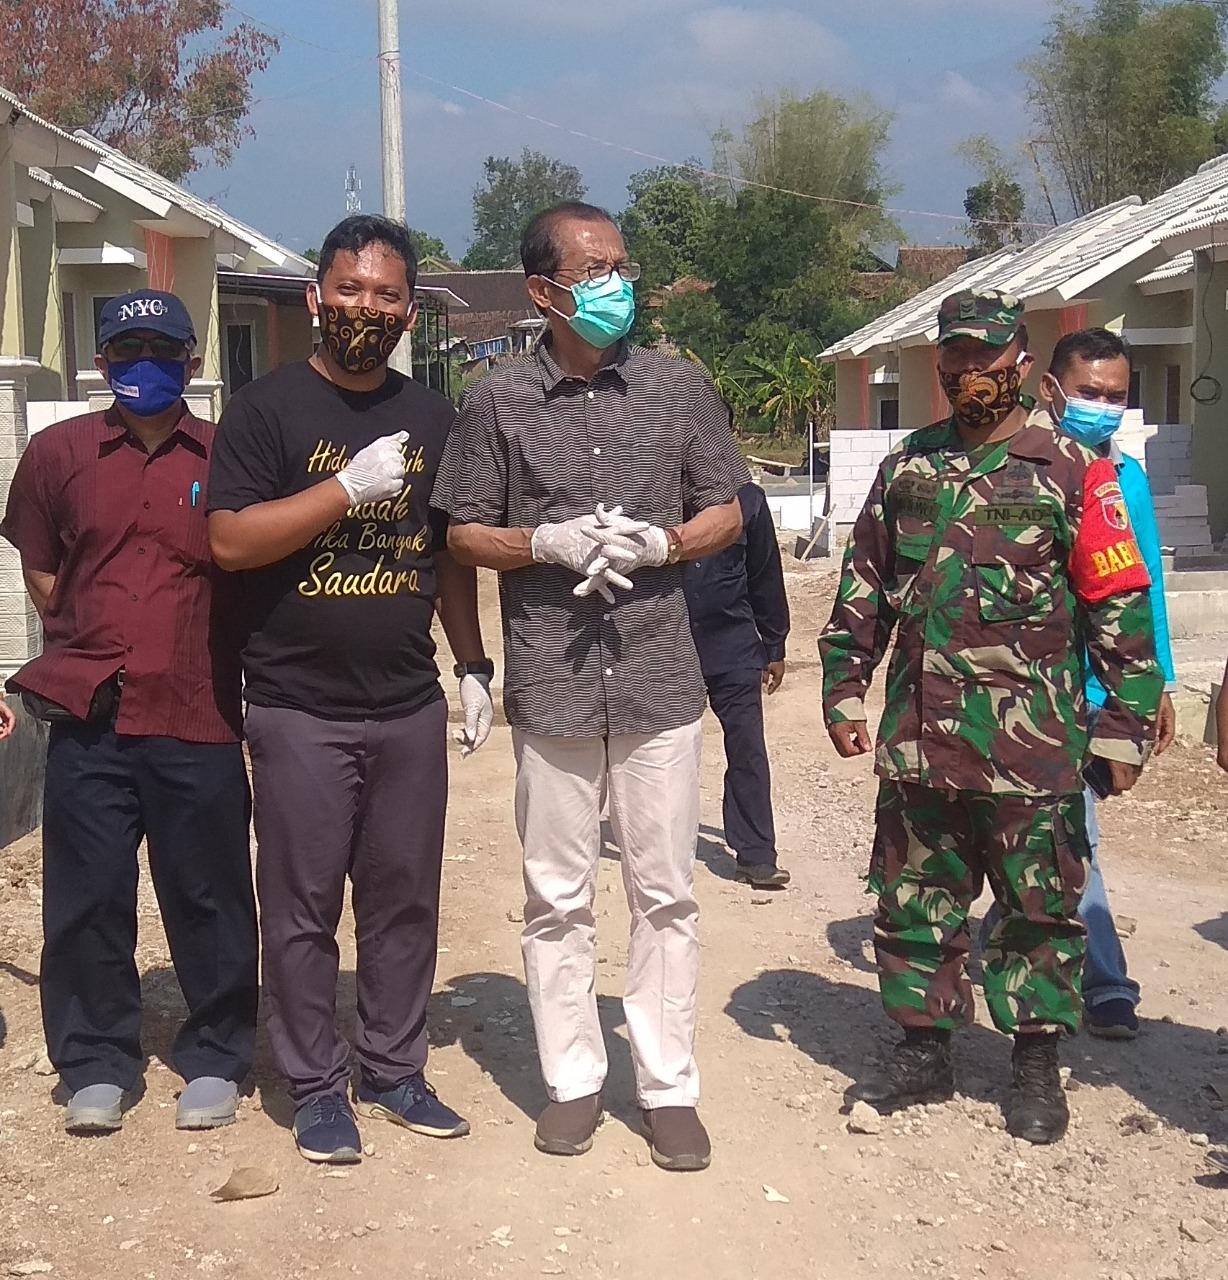 RSUD Magetan Sudah Punya  2 Dokter Ahli Patologi Klinik Untuk Menangani Lab Swap Covid 19.